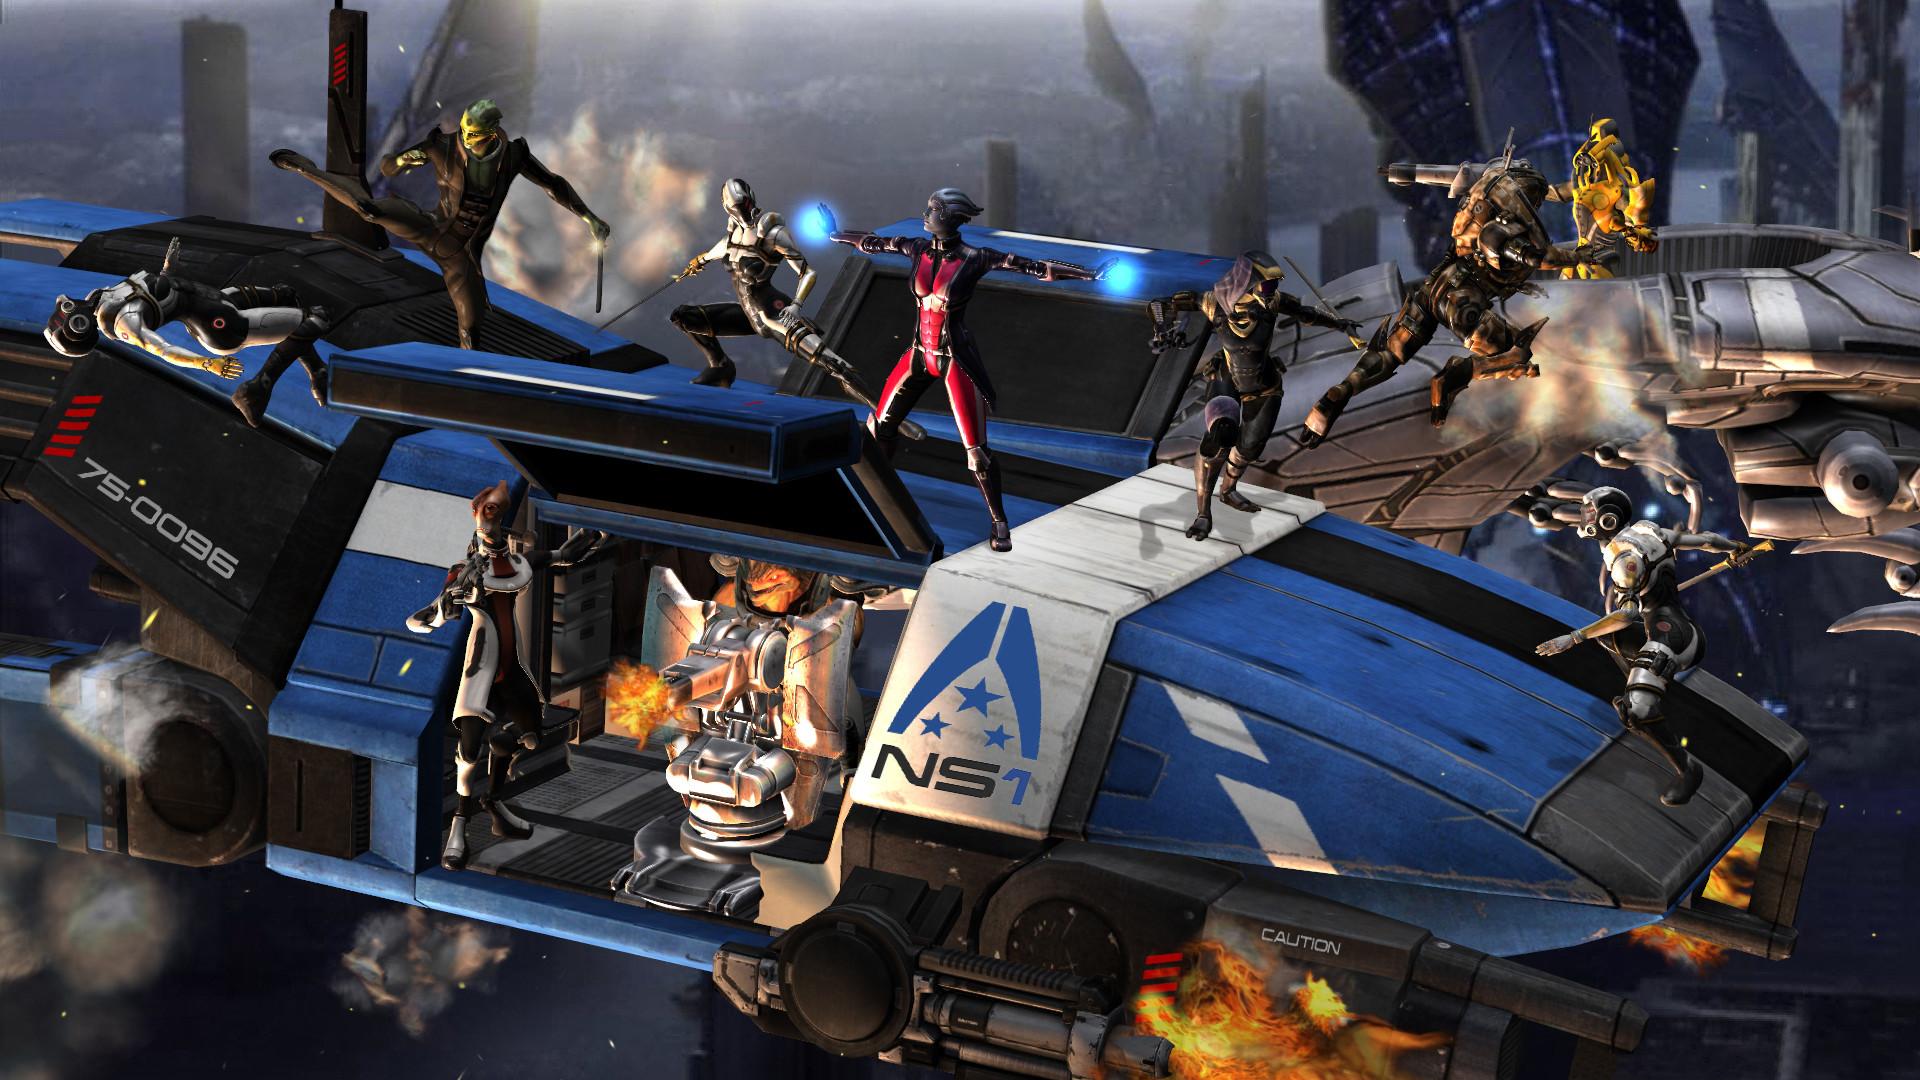 Mass Effect characters Cerberus reapers battle rendering wallpaper |  | 121835 | WallpaperUP